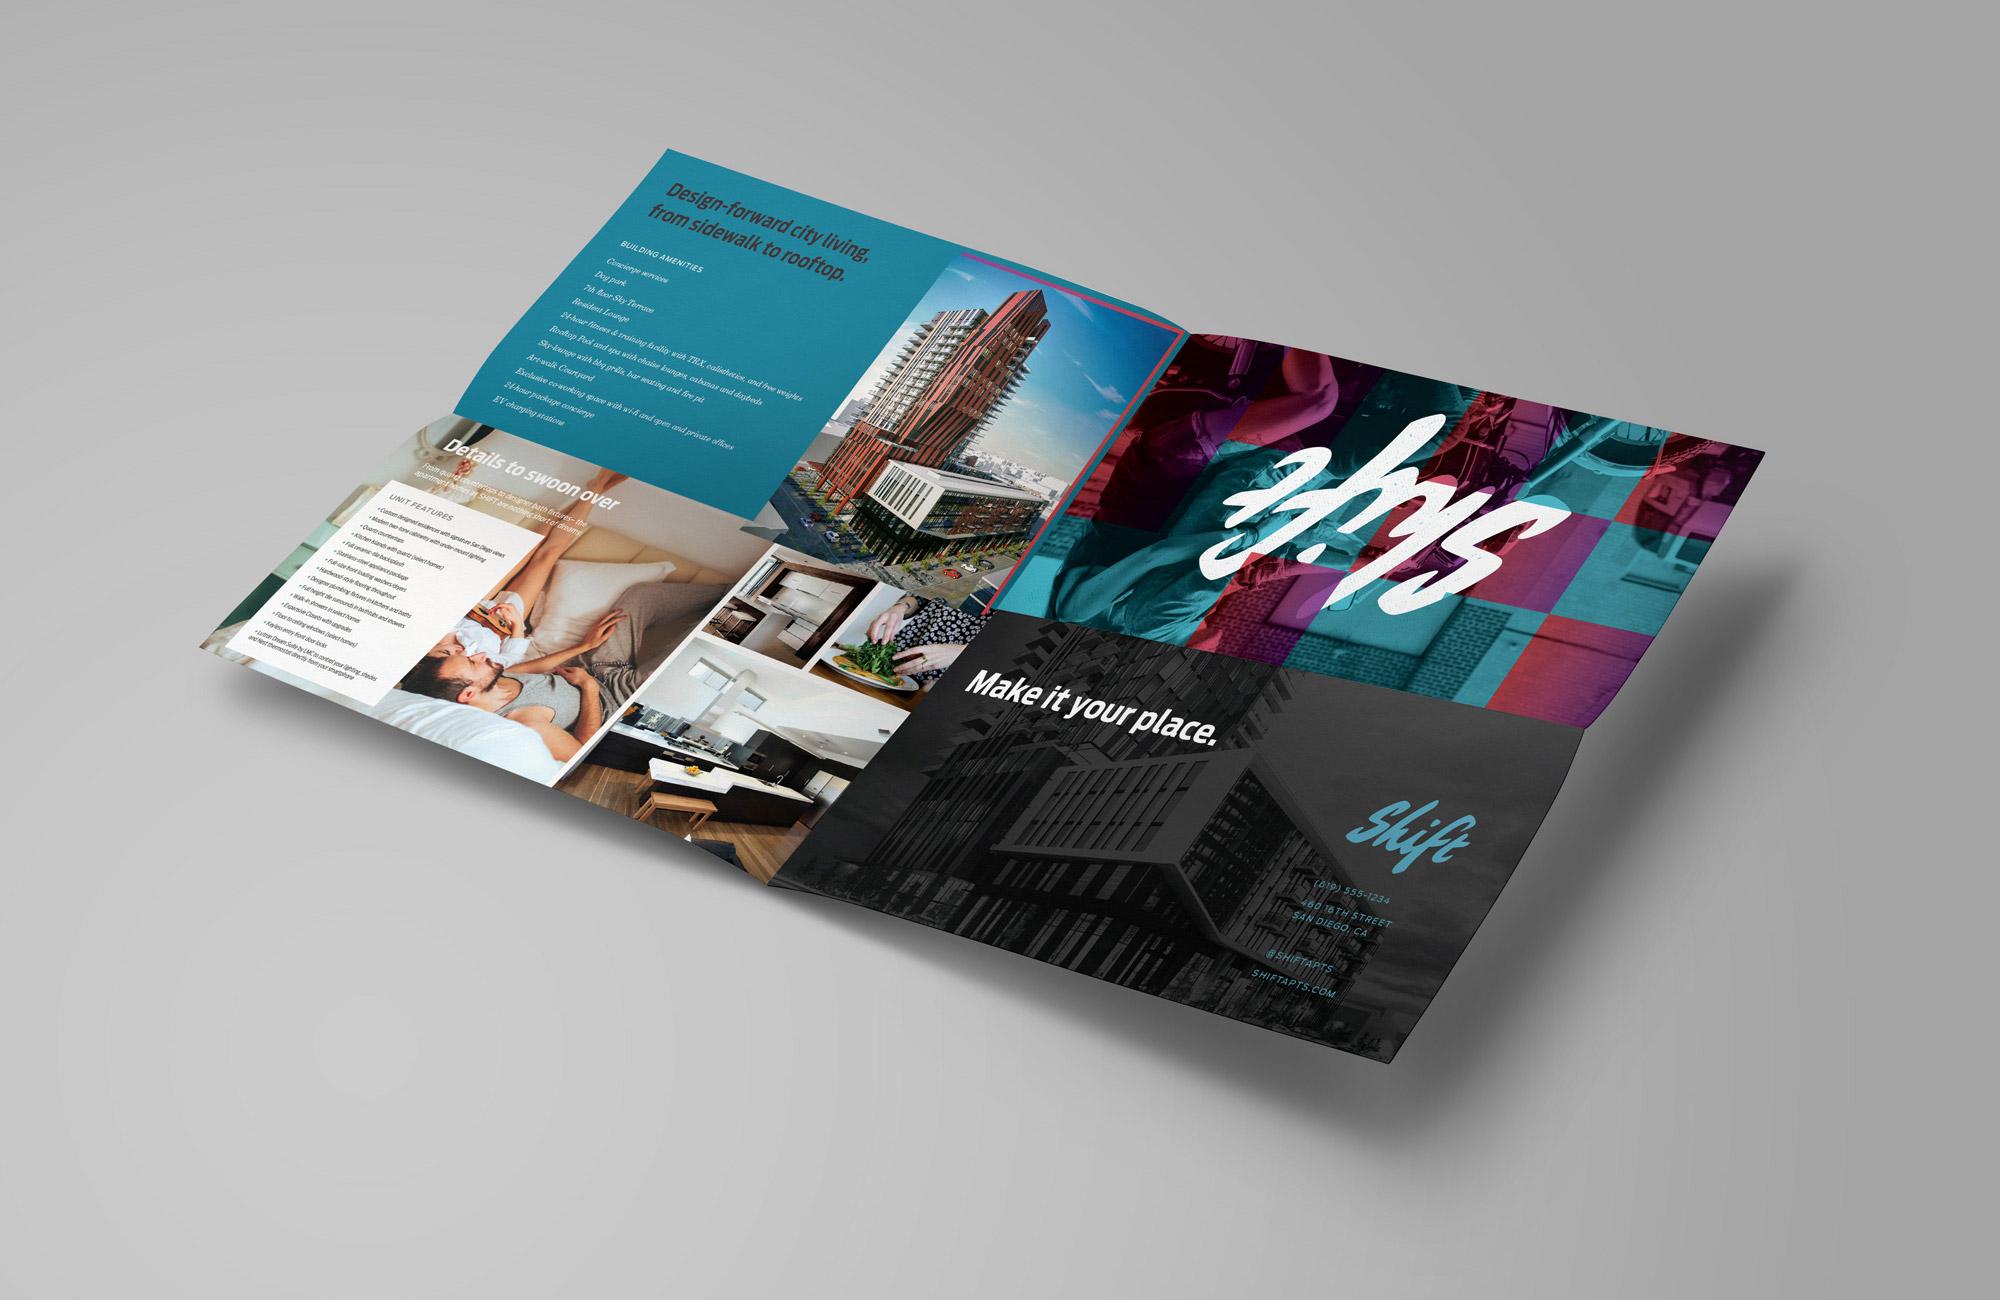 miriello-grafico_SHIFT-San-Diego-East-Village-Downtown-apartment-branding-02.jpg